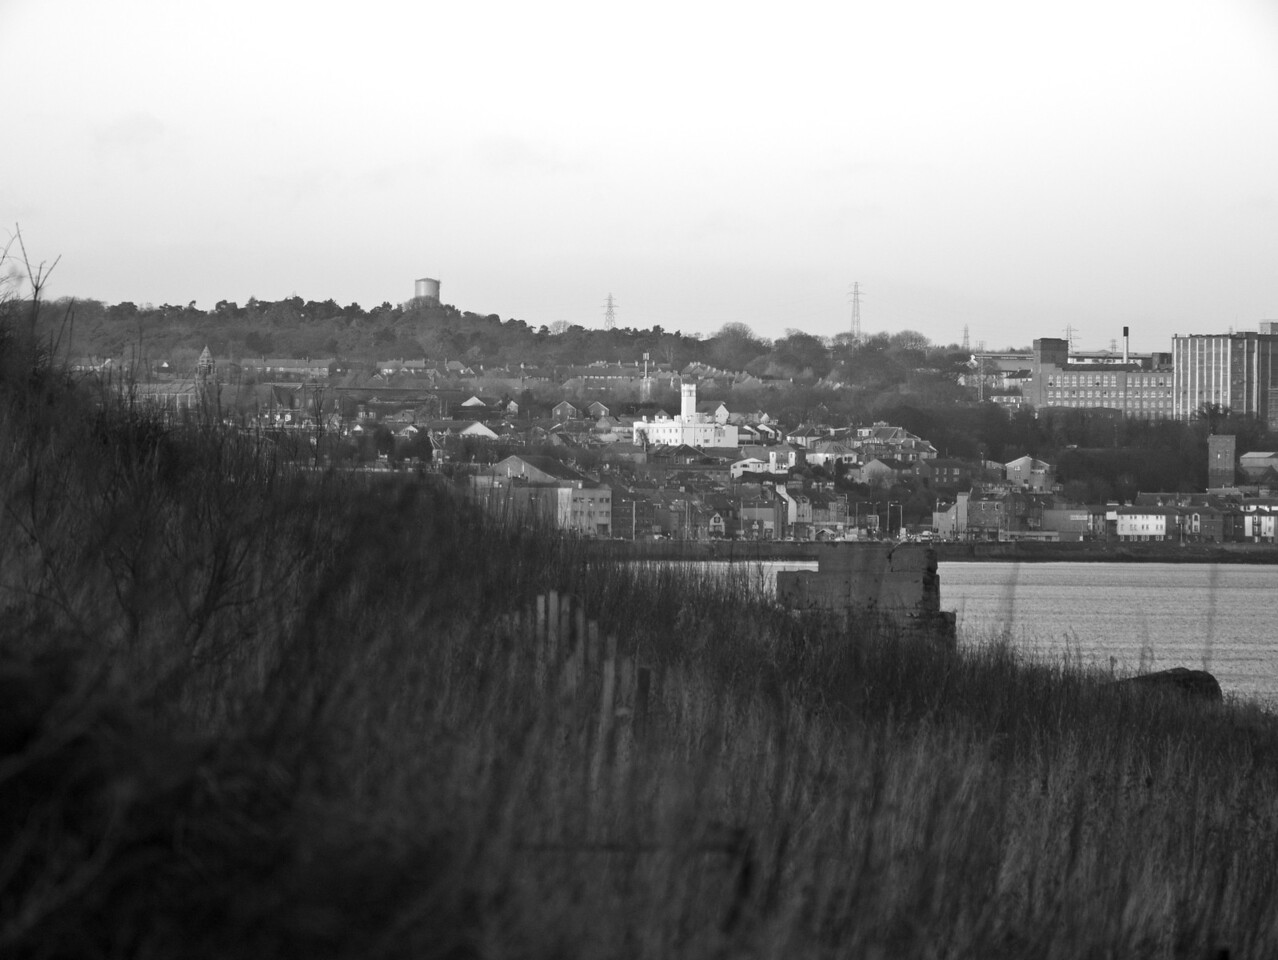 Full zoom of Kirkcaldy in black and white